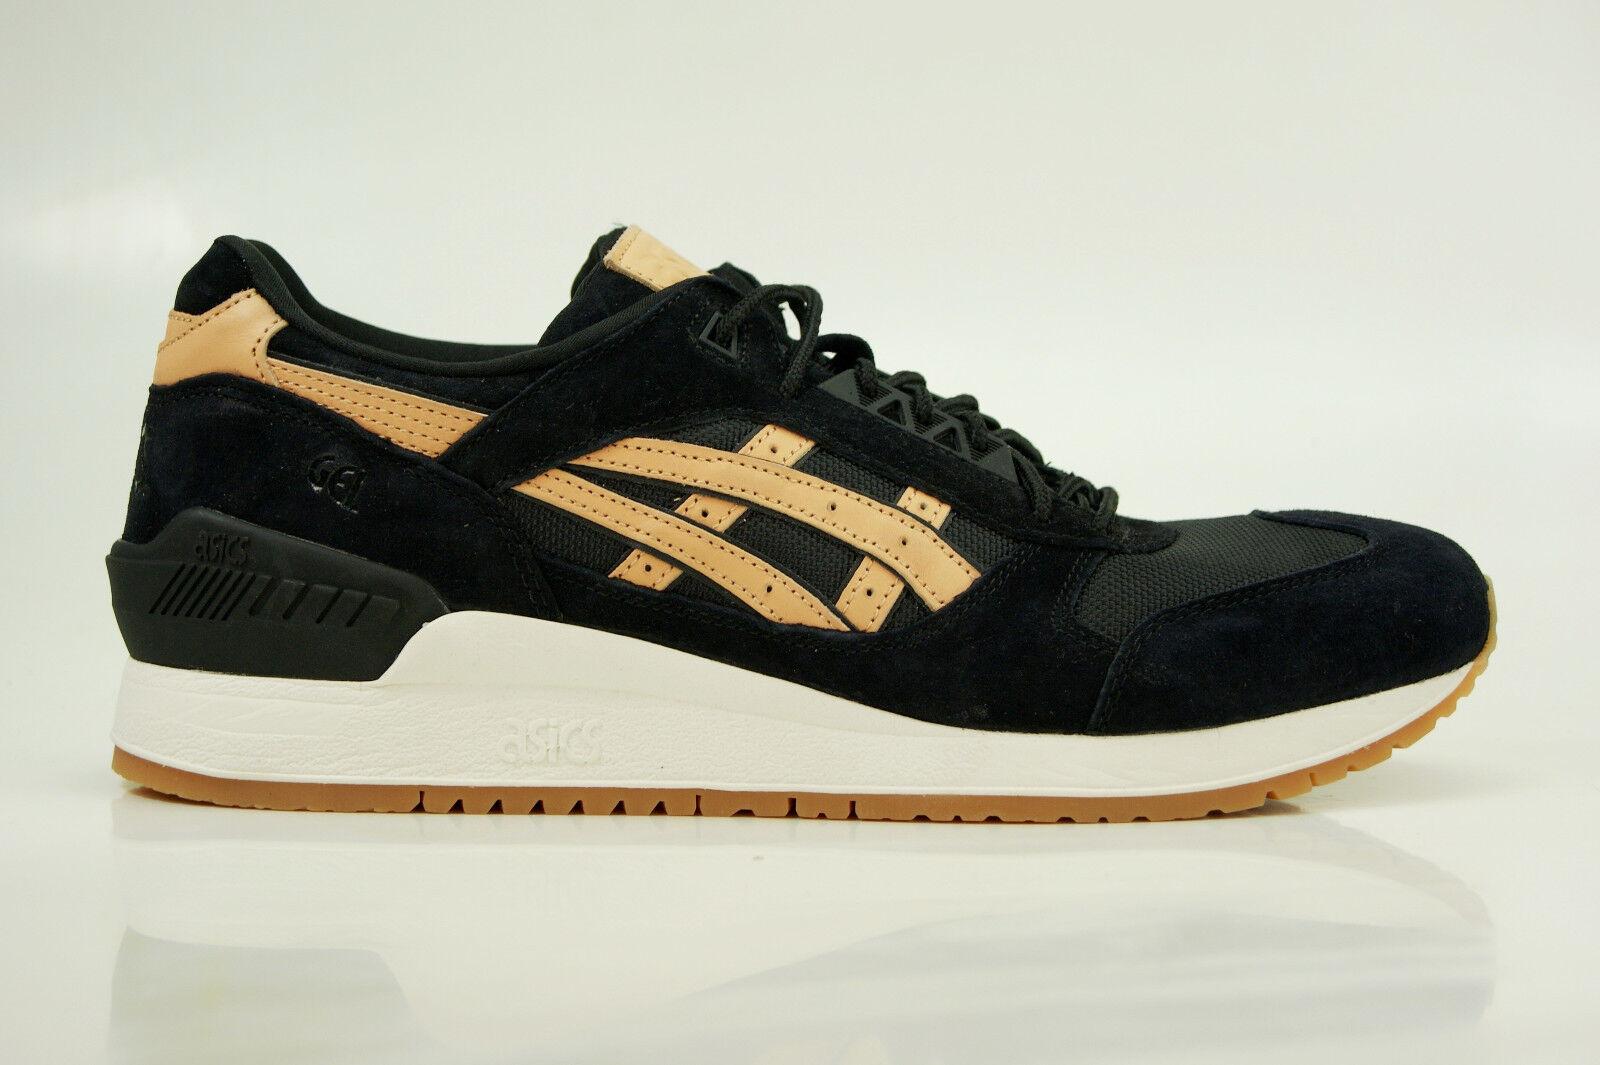 Asics Gel-Respector Sportschuhe Sneakers Turnschuhe Sportschuhe Gel-Respector Herren Schuhe H6T4L-9005 43db04